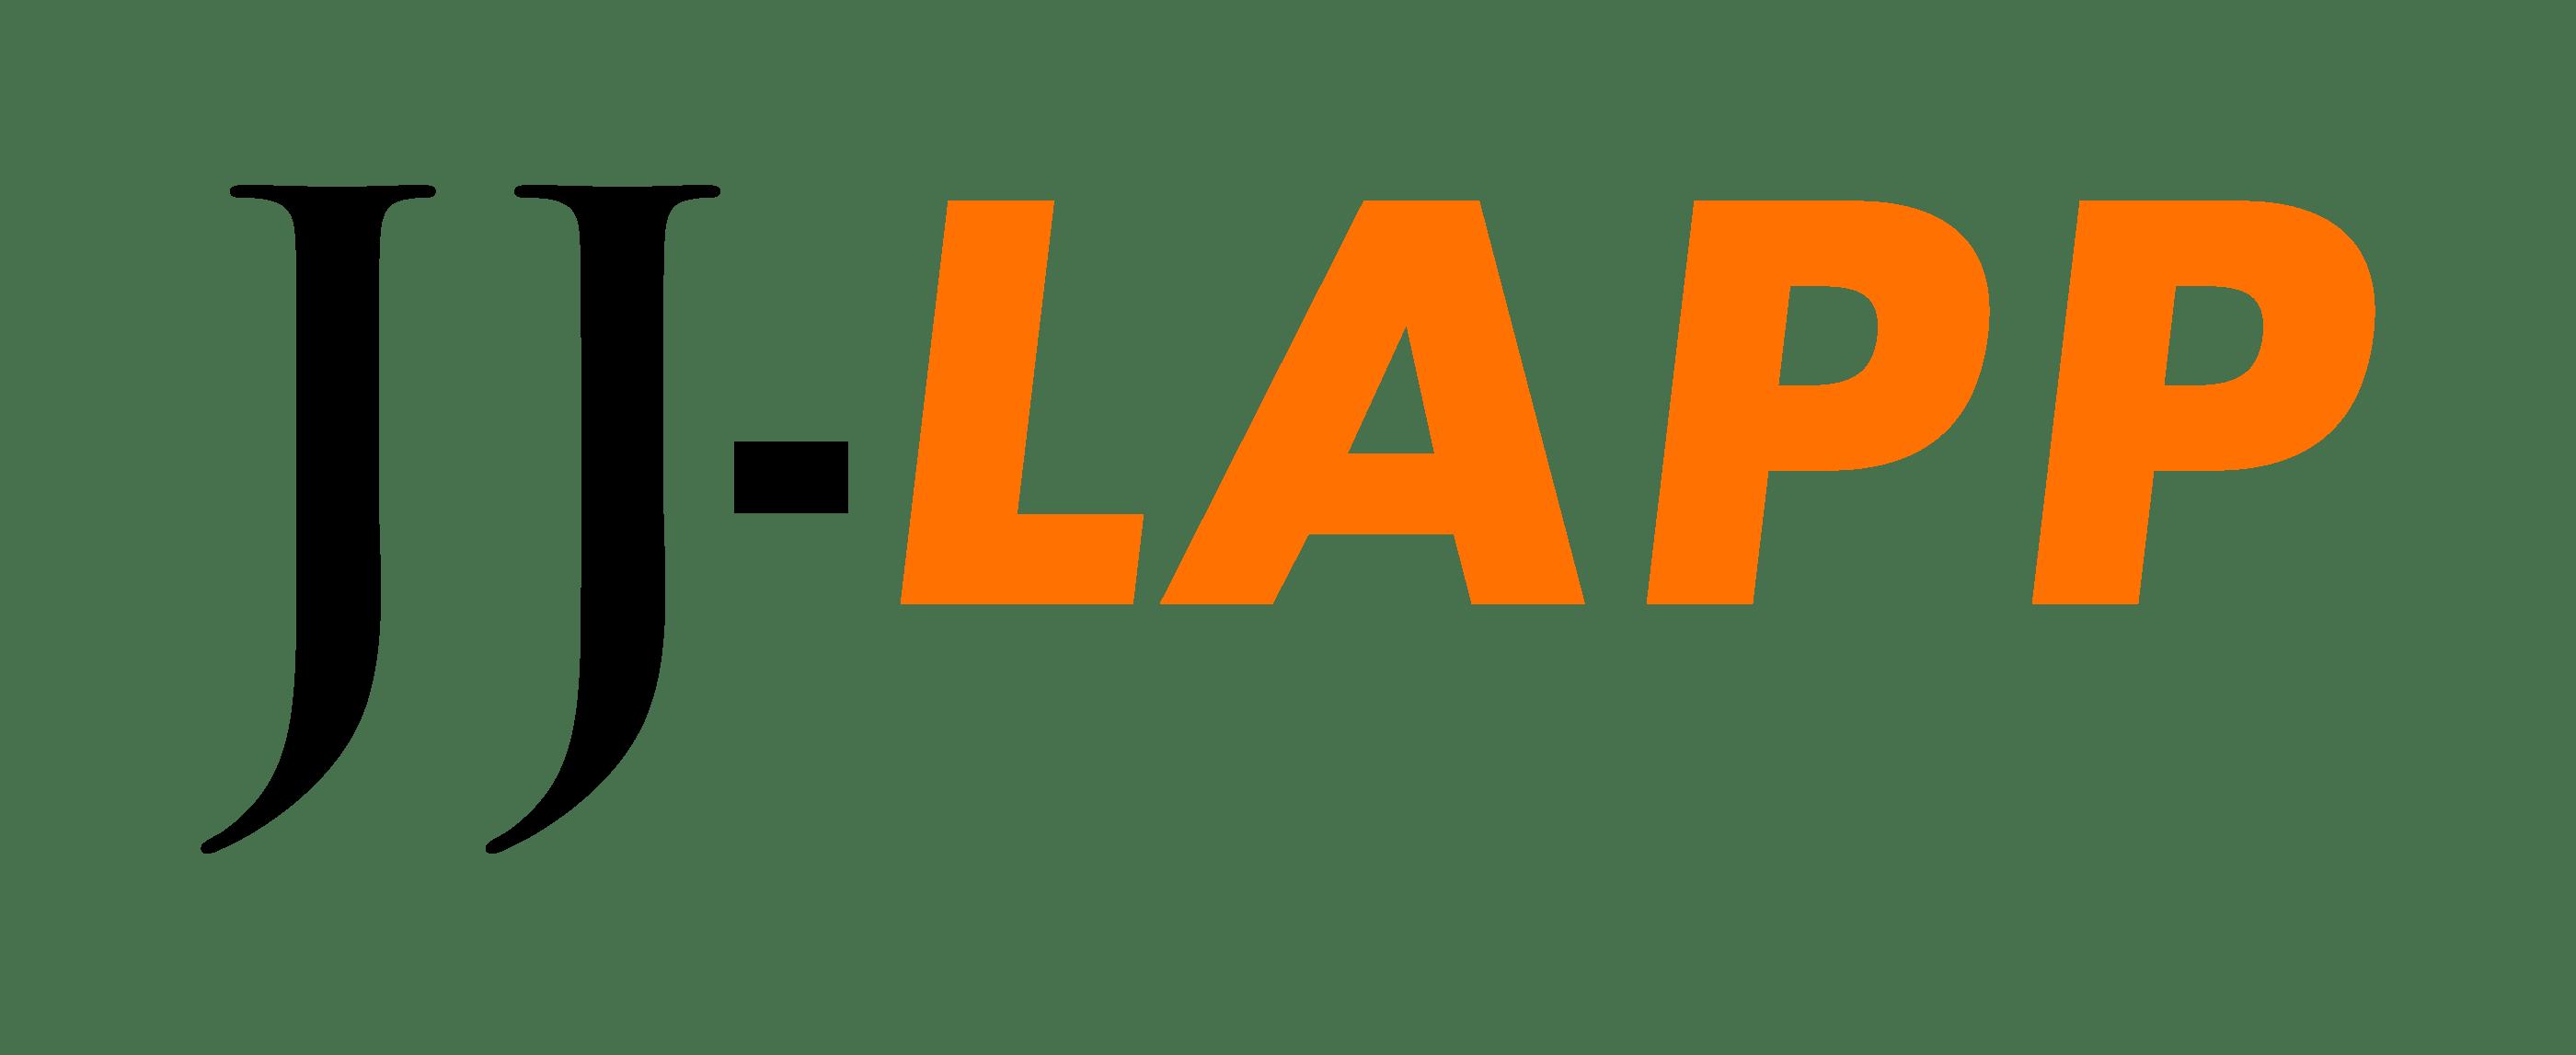 JJ-LAPP Thailand Distributor_PVezRack by Clenergy